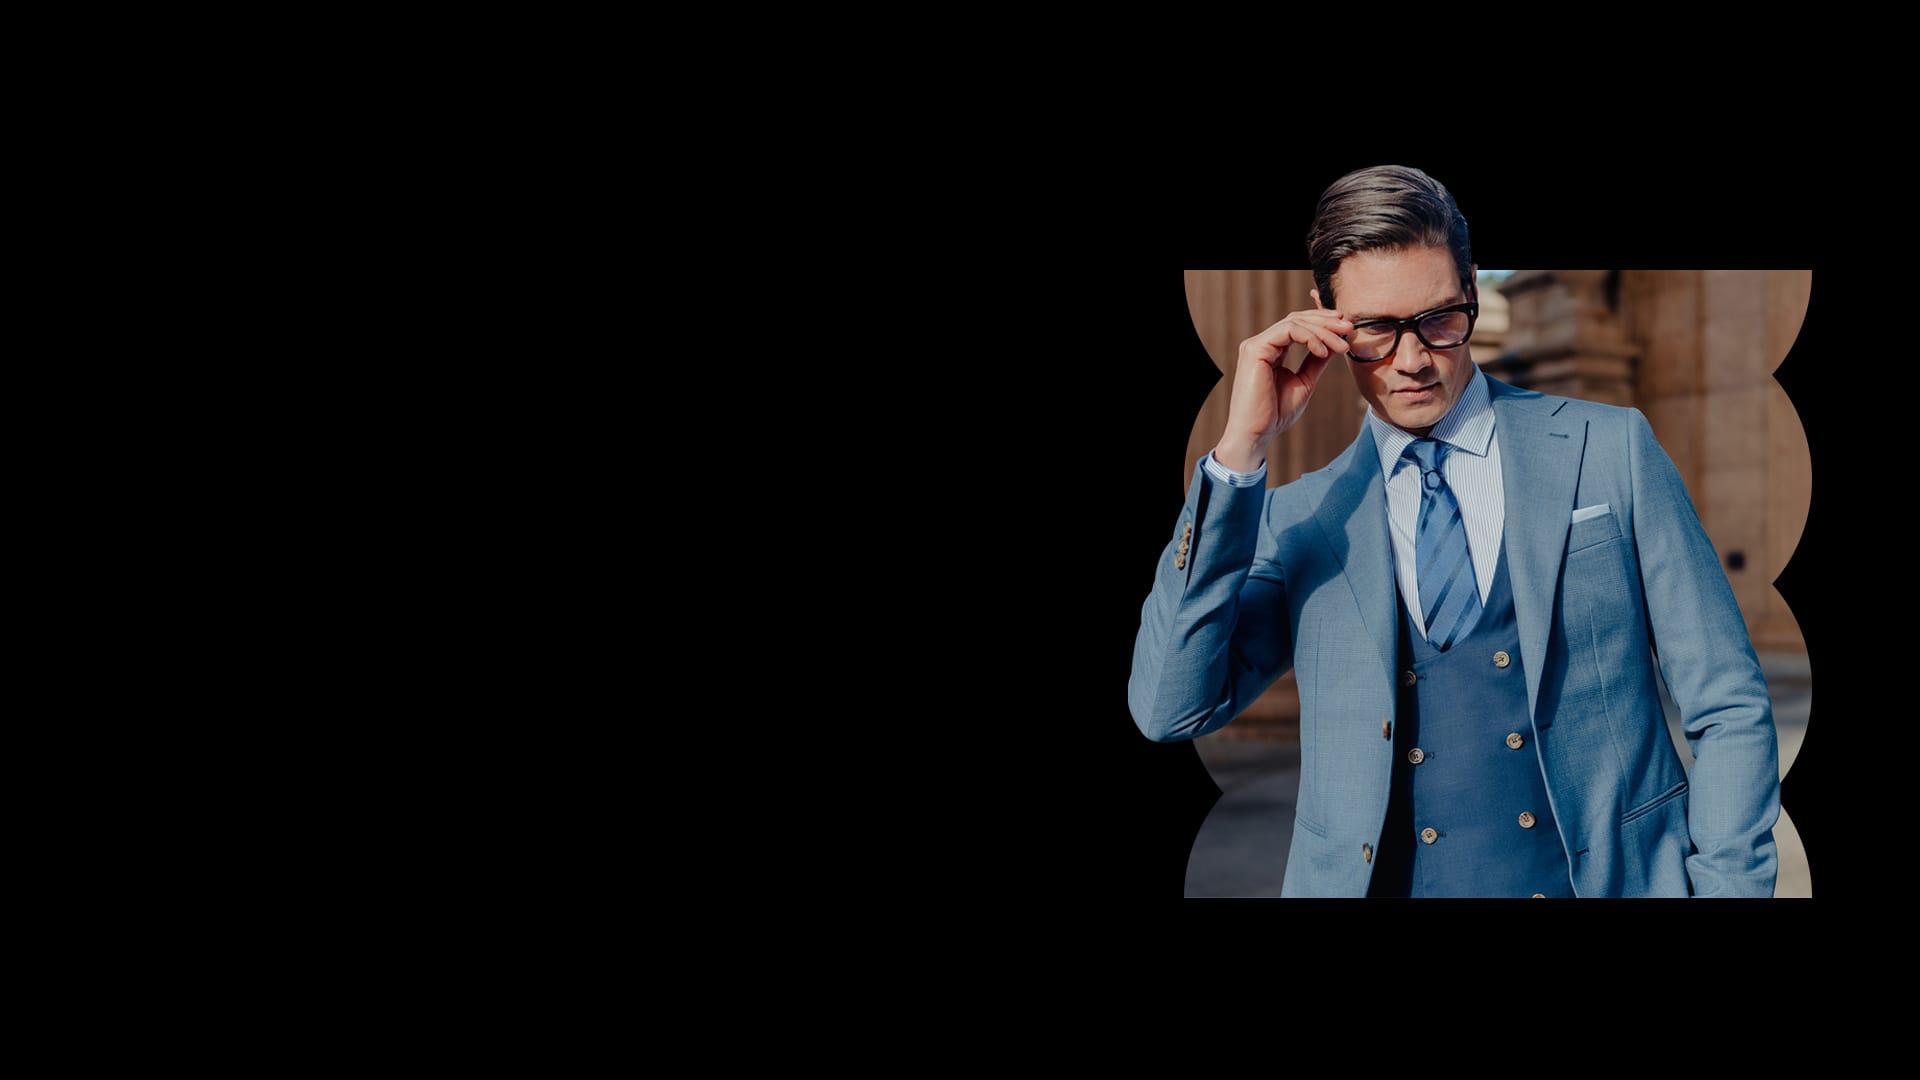 Man wearing INDOCHINO suit